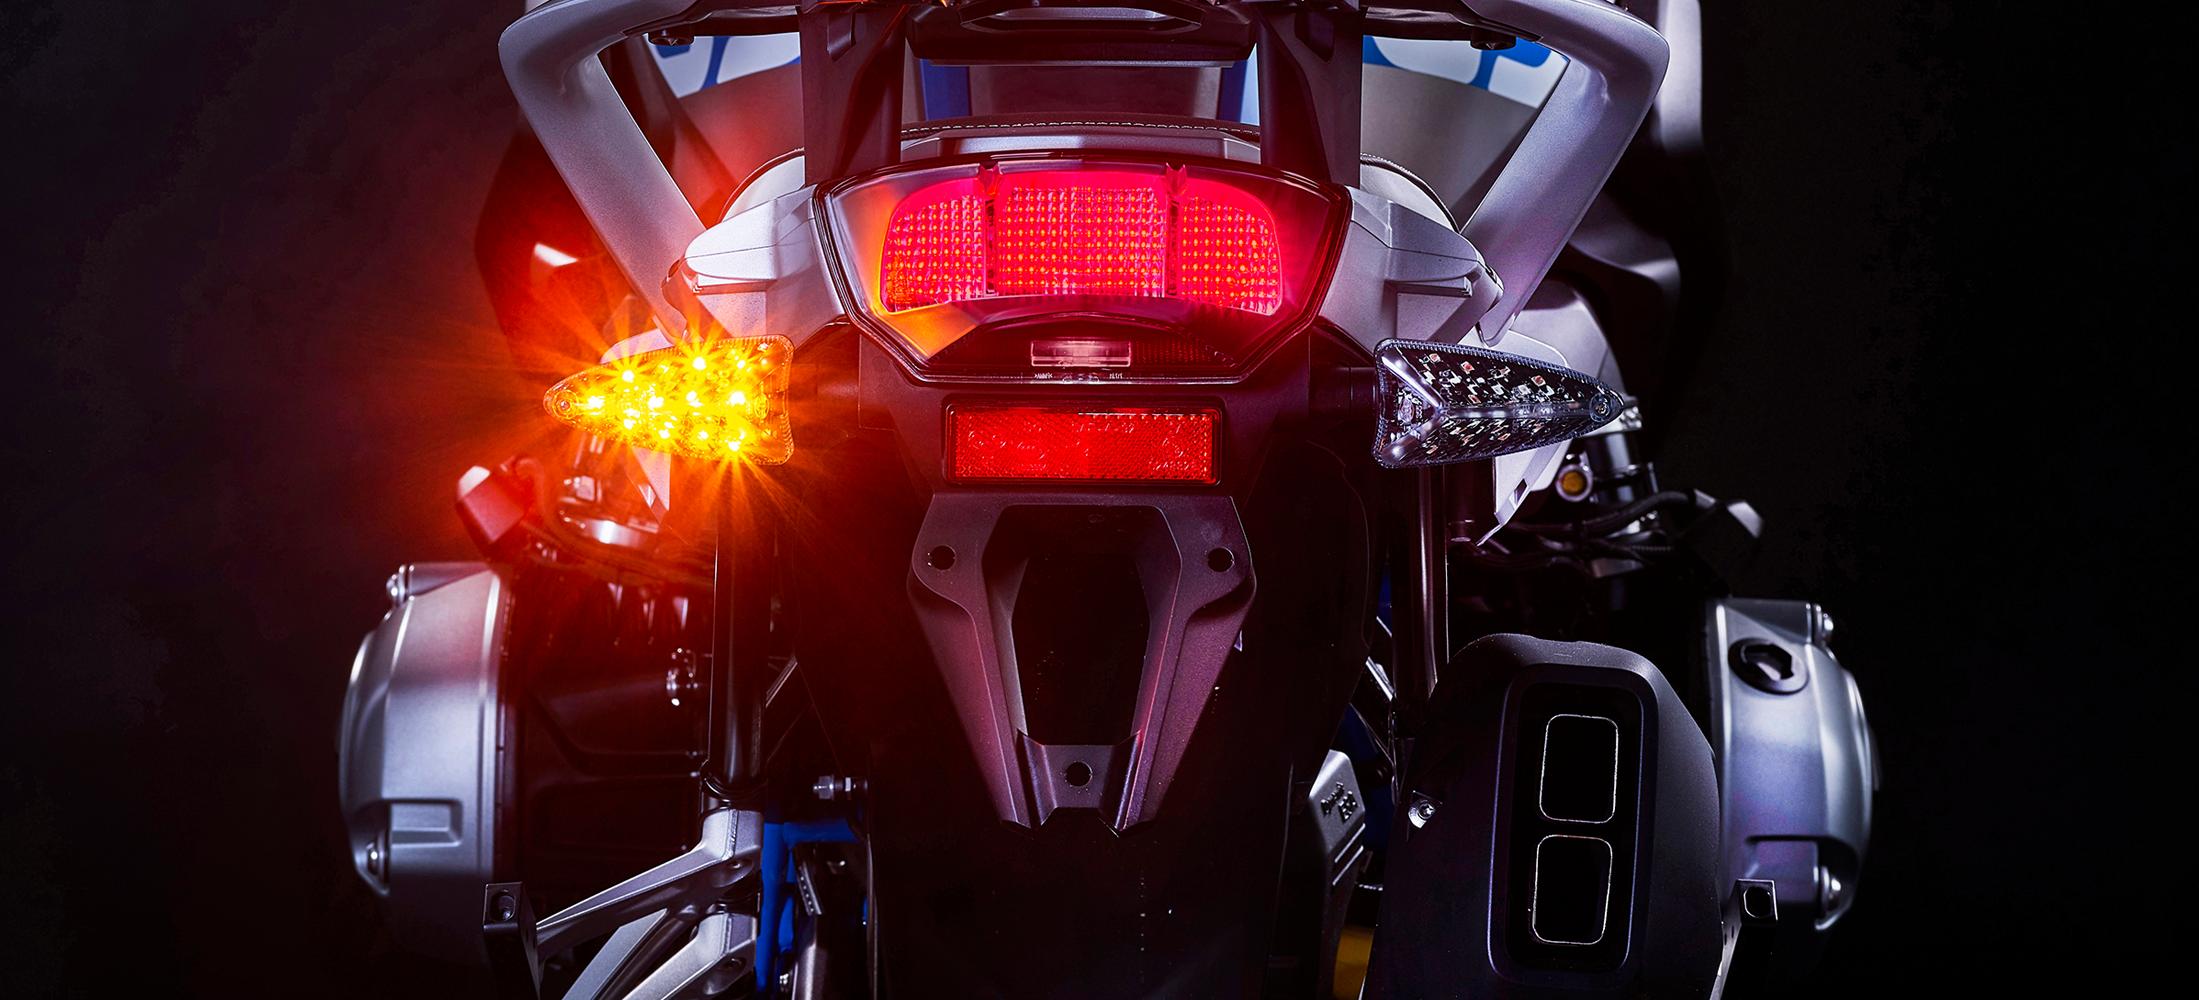 2-in-1 Dual Motorcycle LED Brake Light/Turn Signal Upgrades